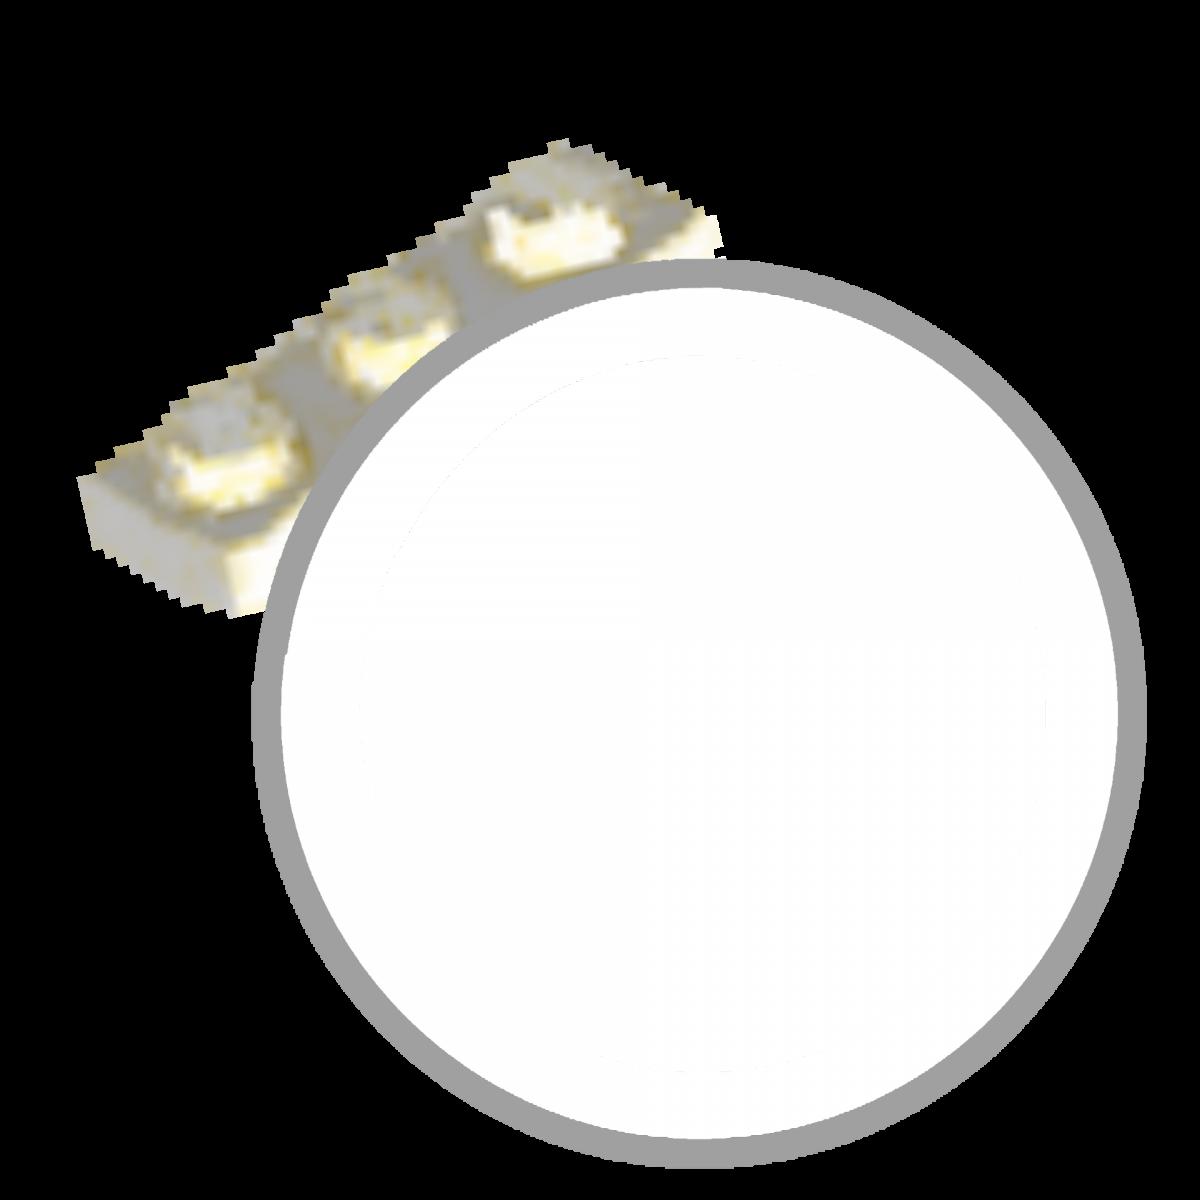 large.White_default.png.472084fe0ab2e433f213c01df5572f6a.png